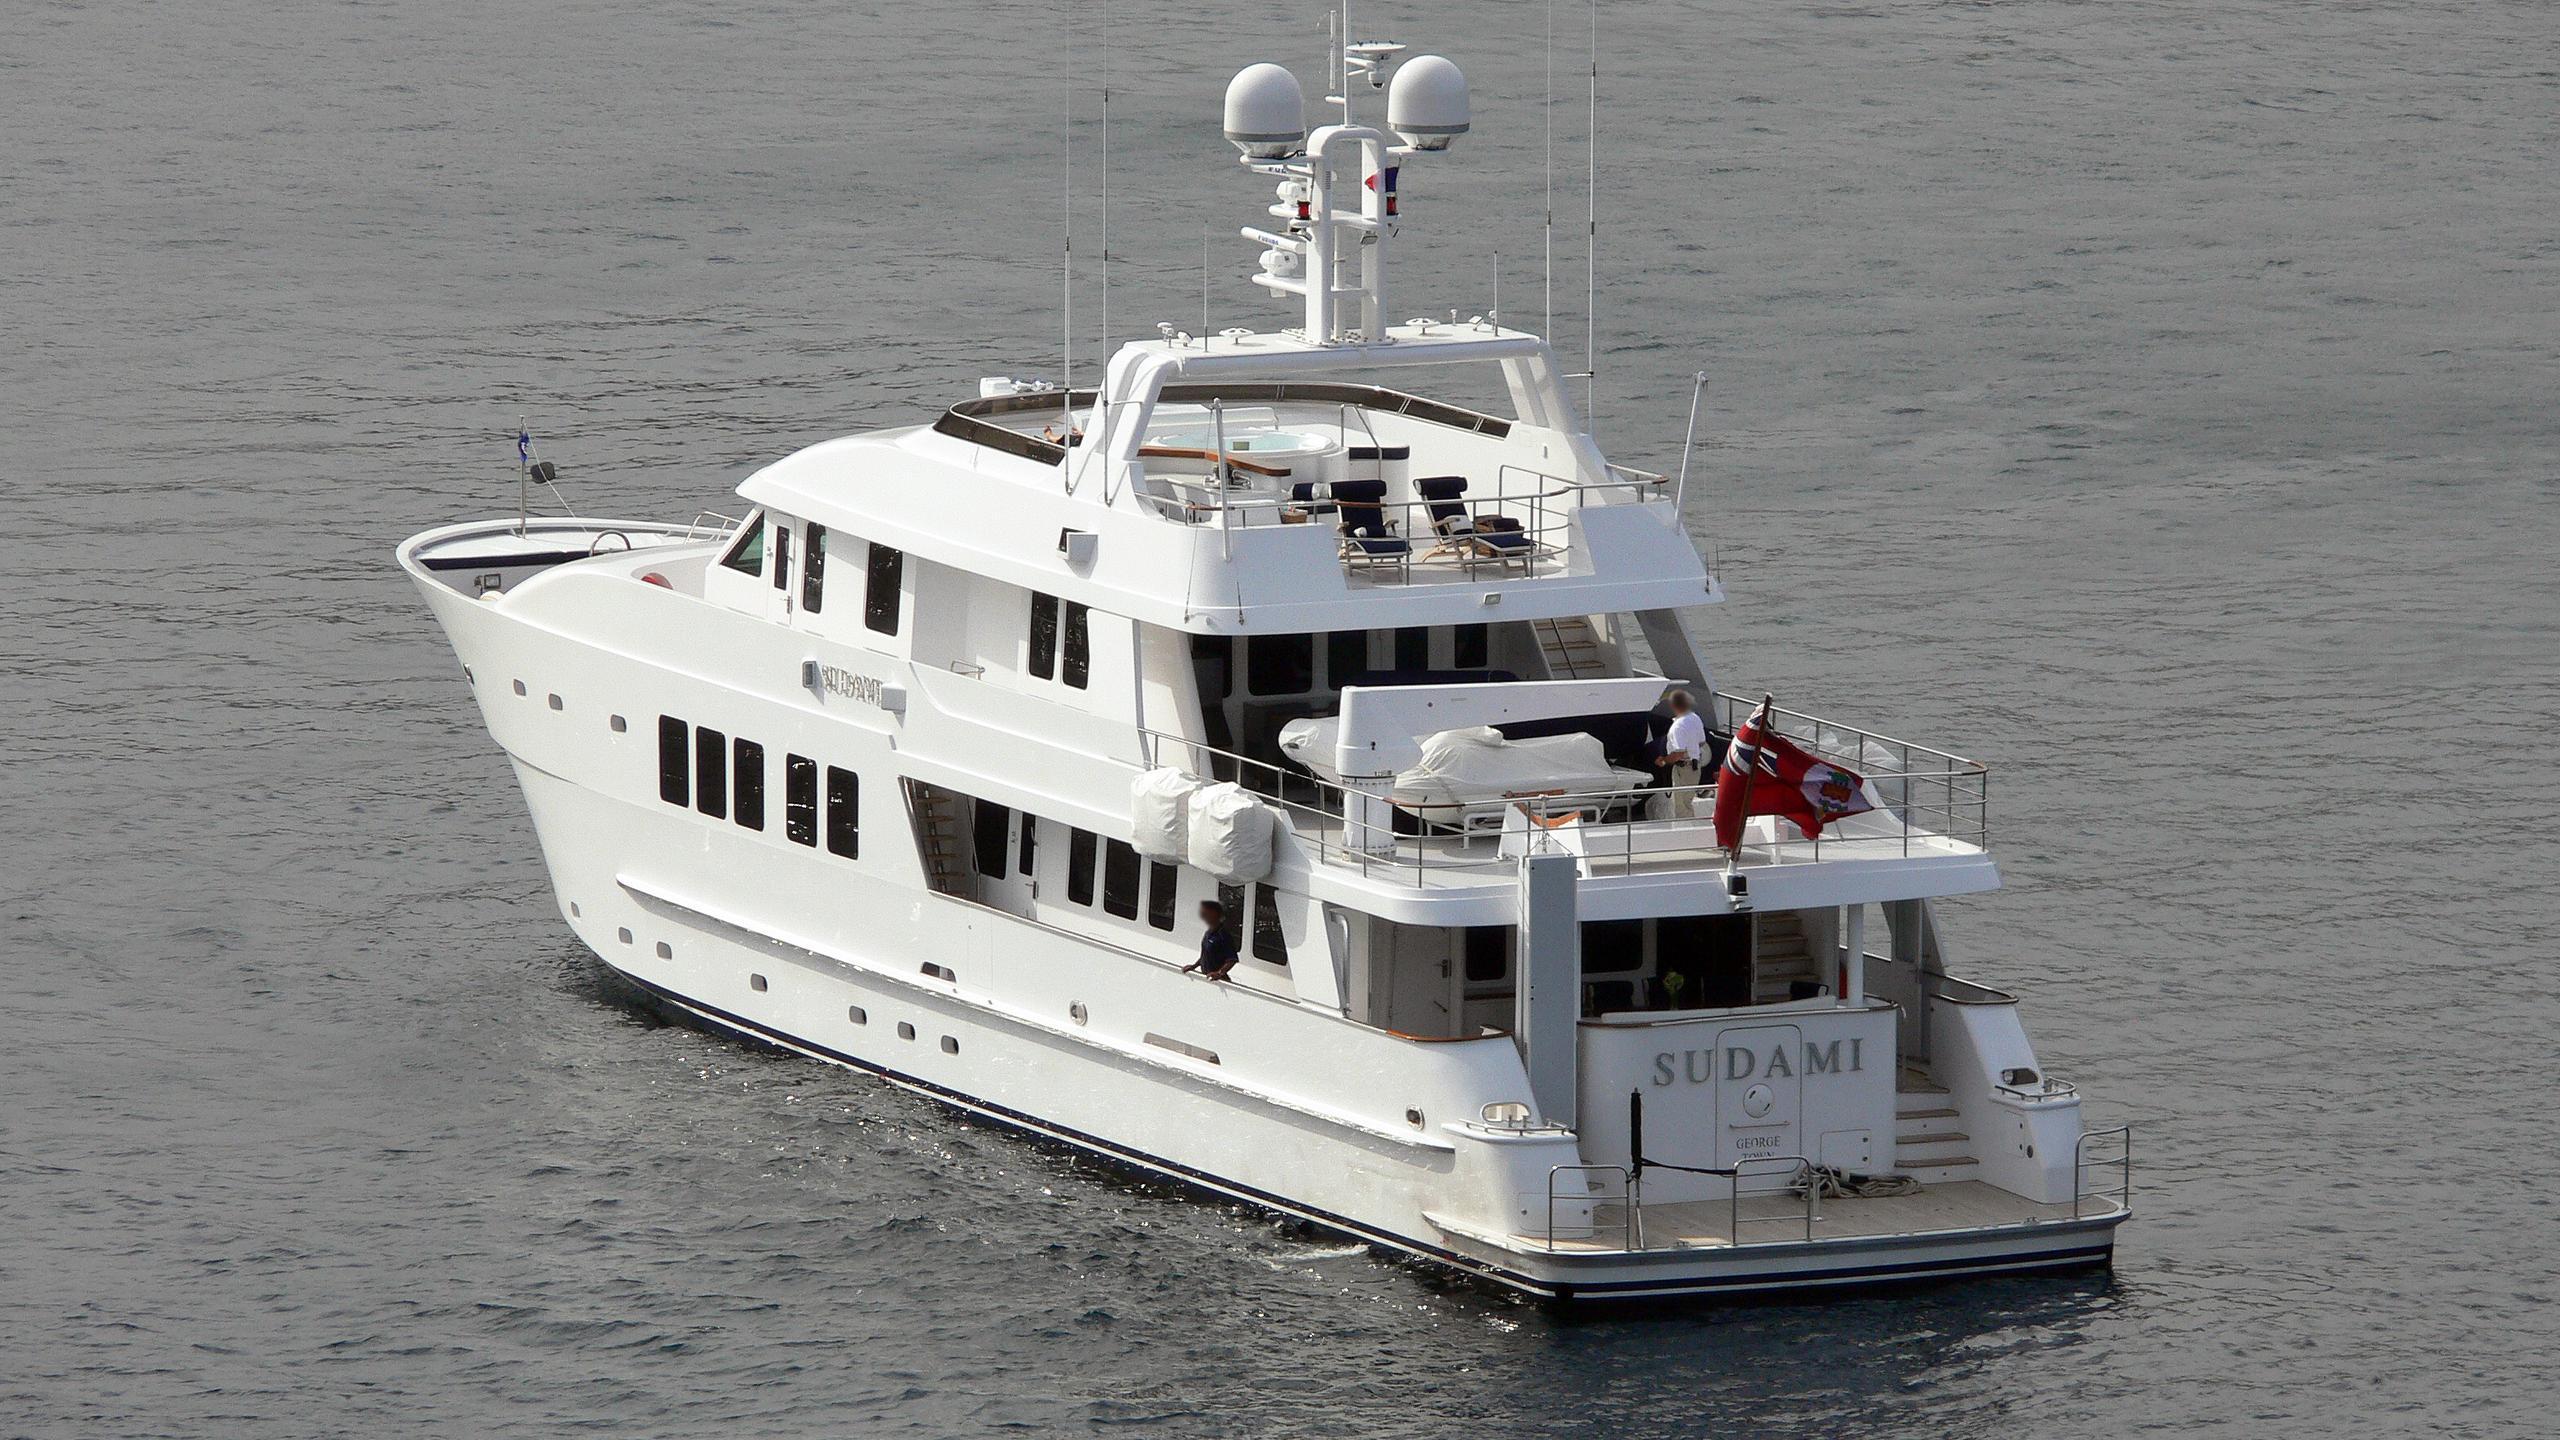 explorer-sudami-motor-yacht-inace-110-2007-34m-stern